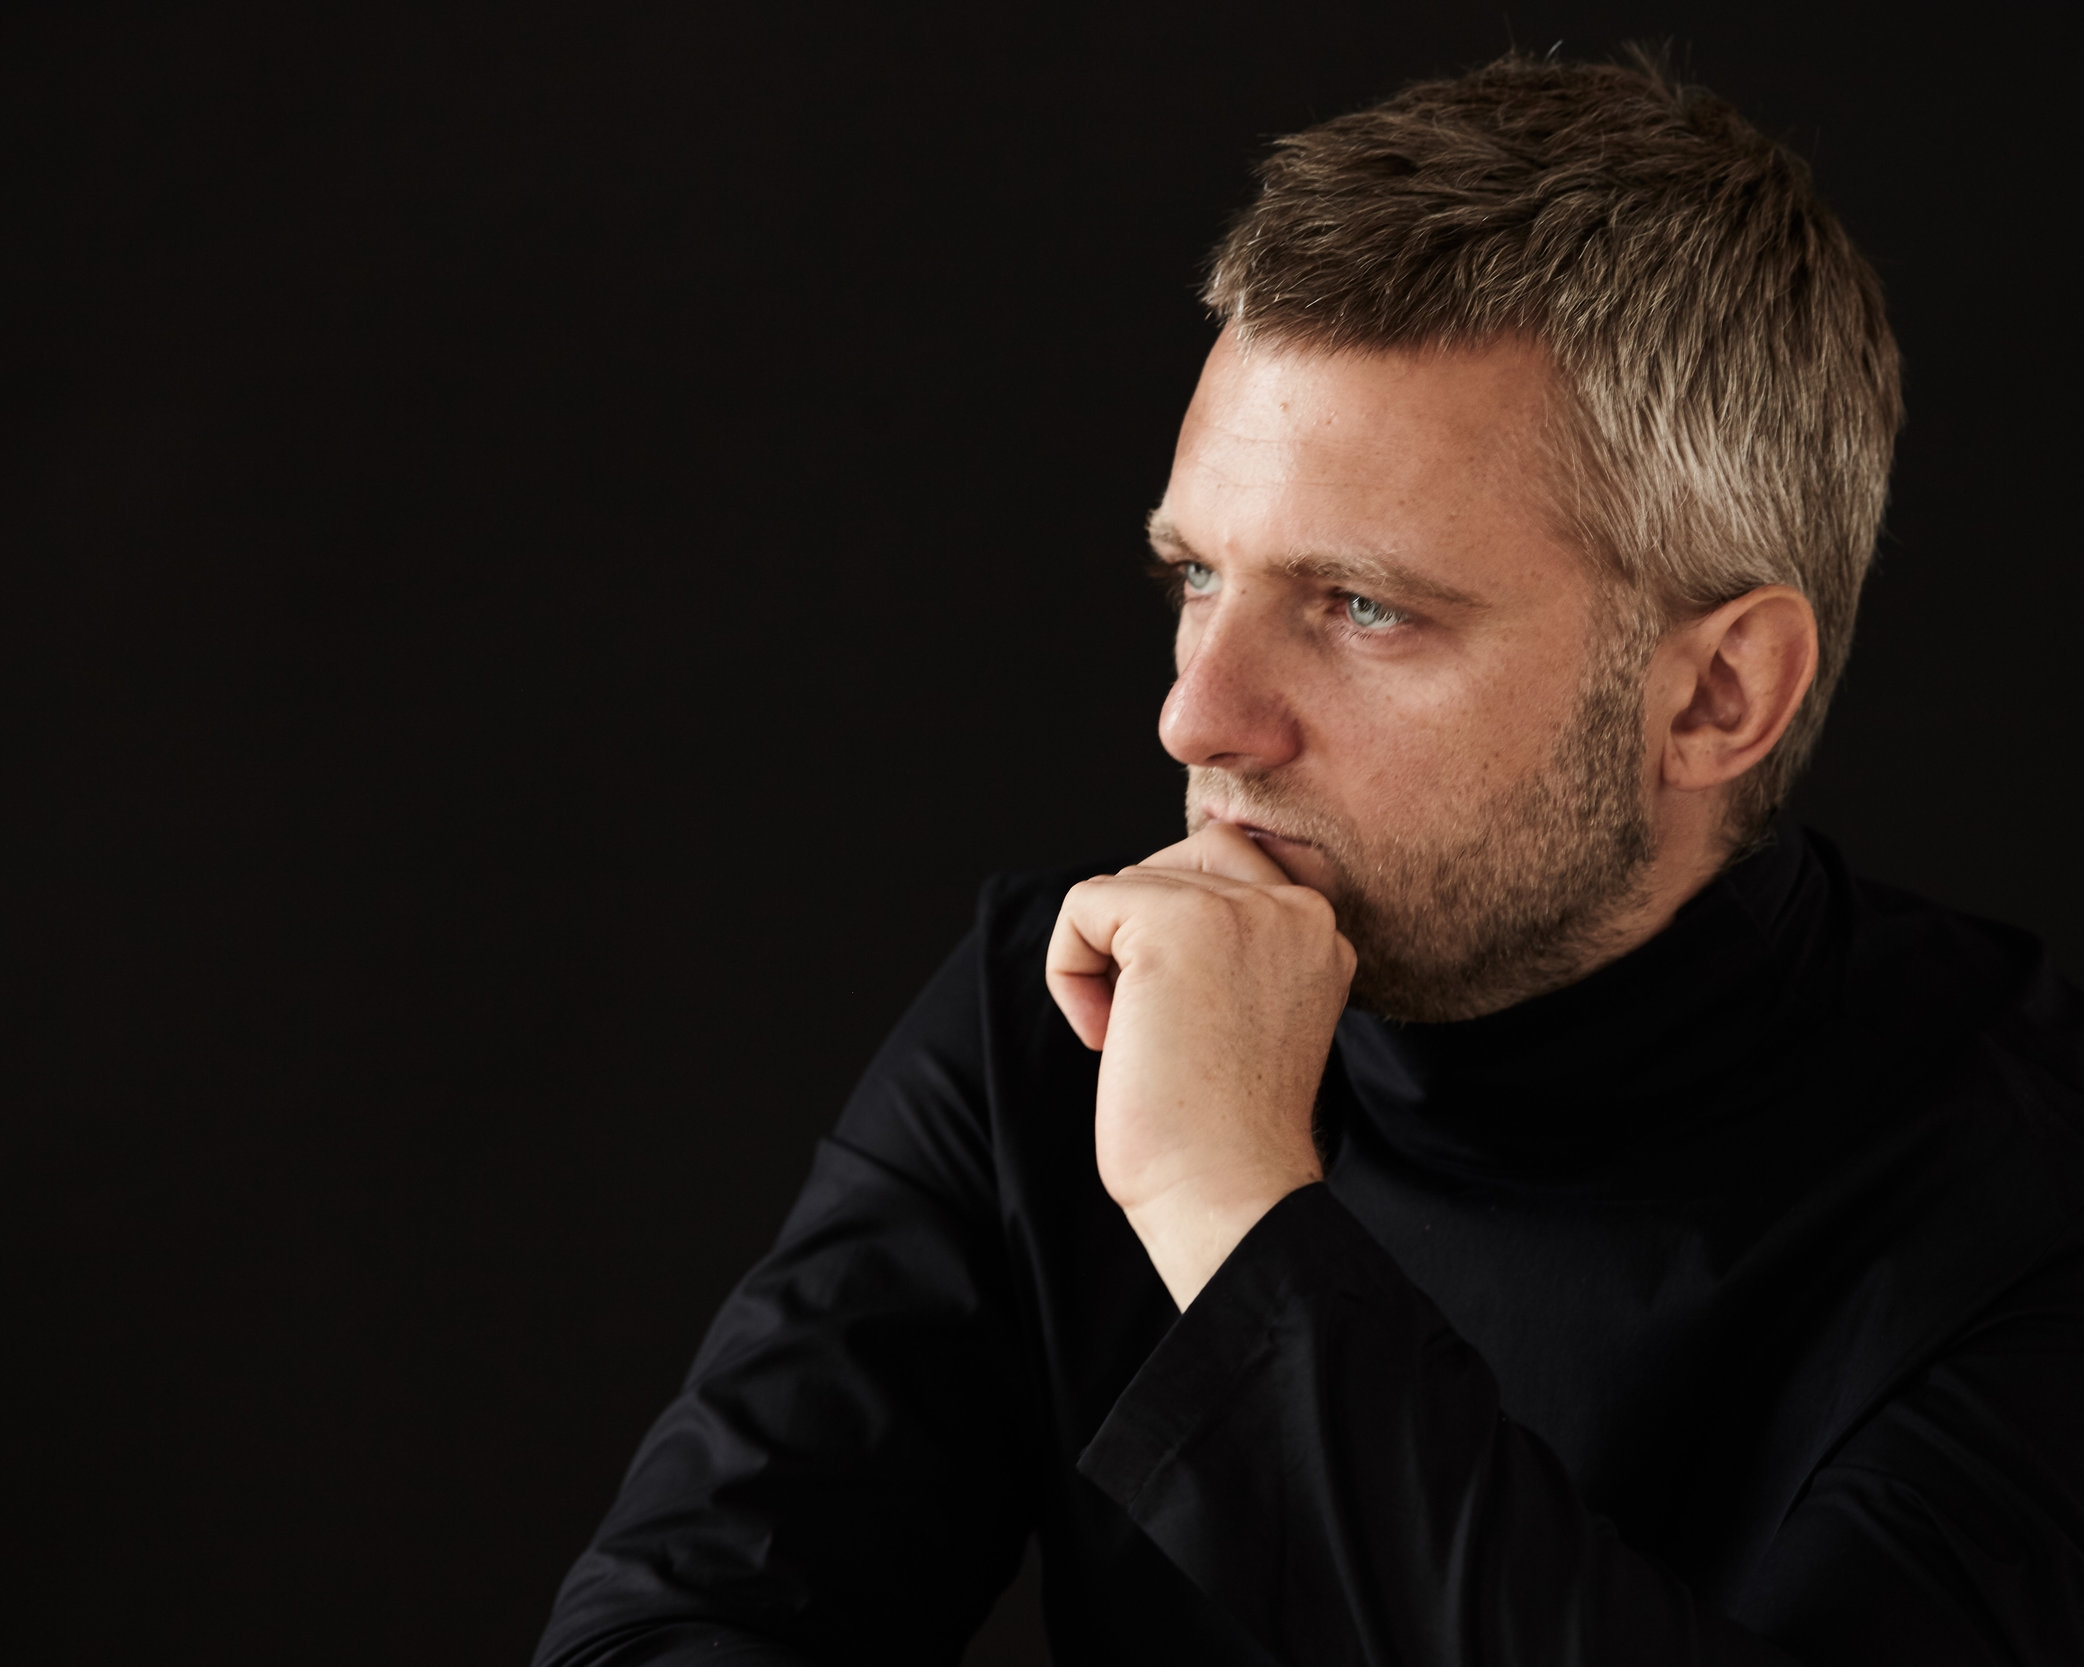 Music Director Kirill Karabits